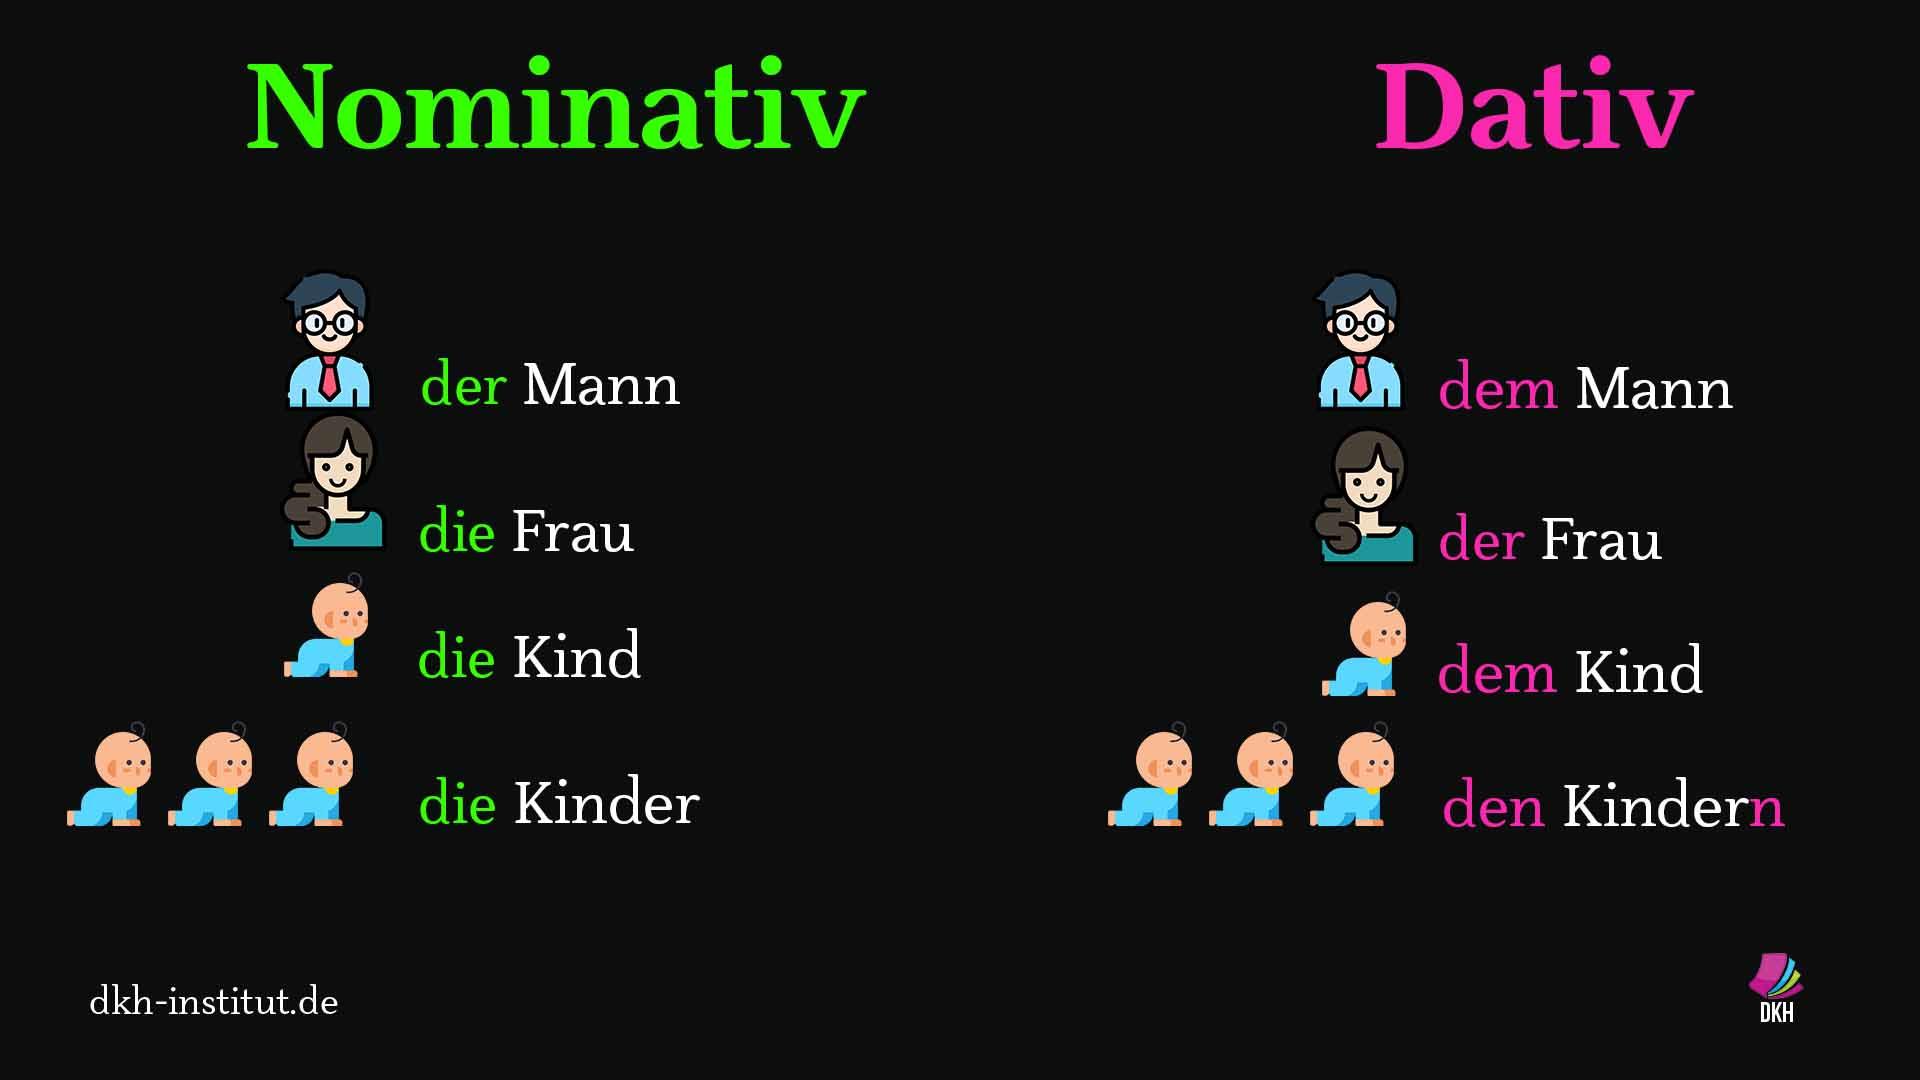 #dativ